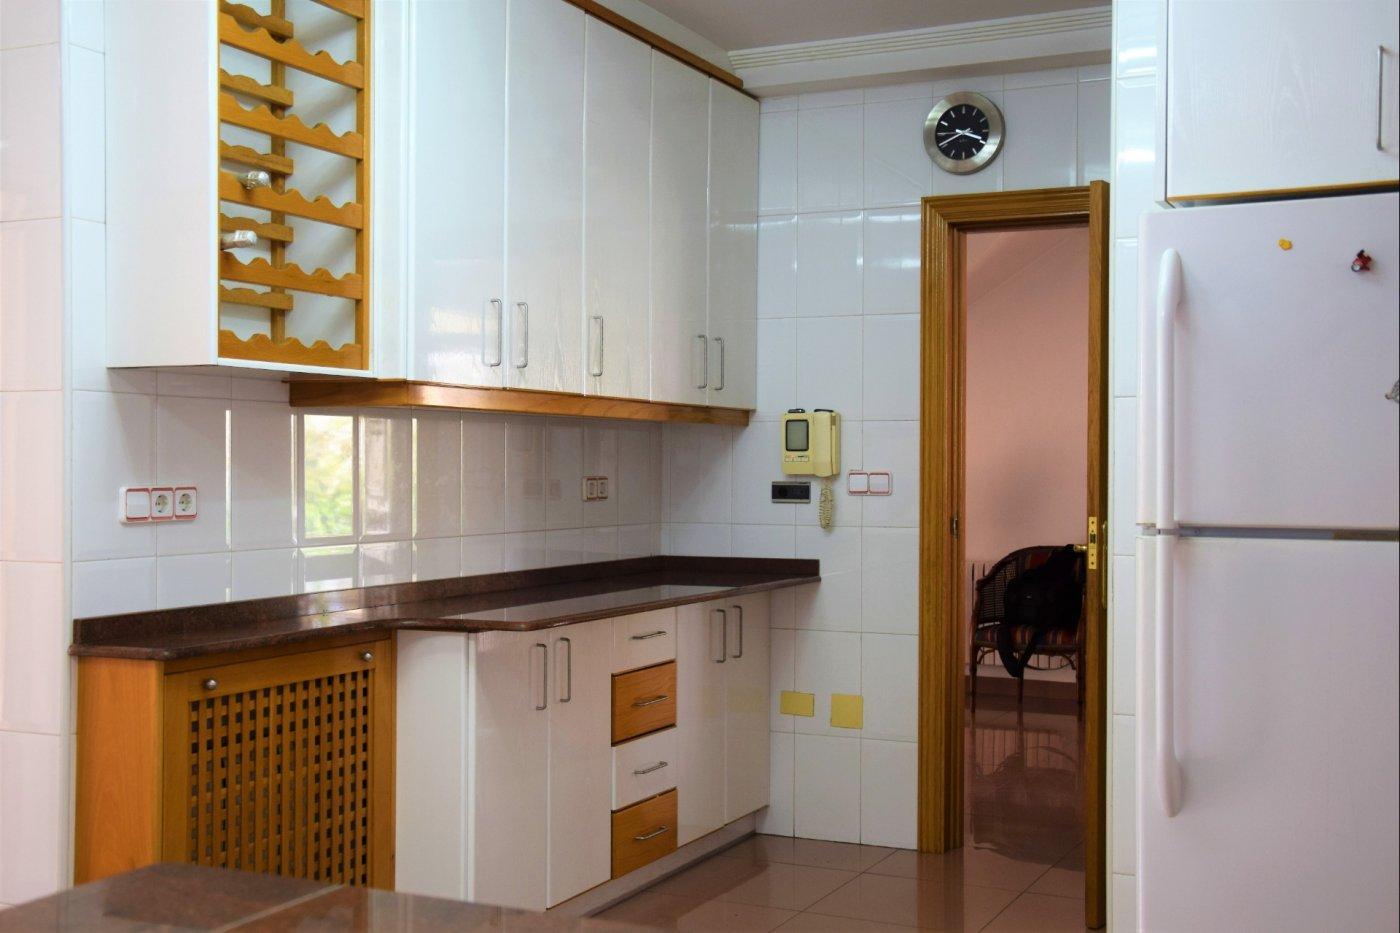 Chalet en Murcia www.joaquincarceles.com JC174 (38)